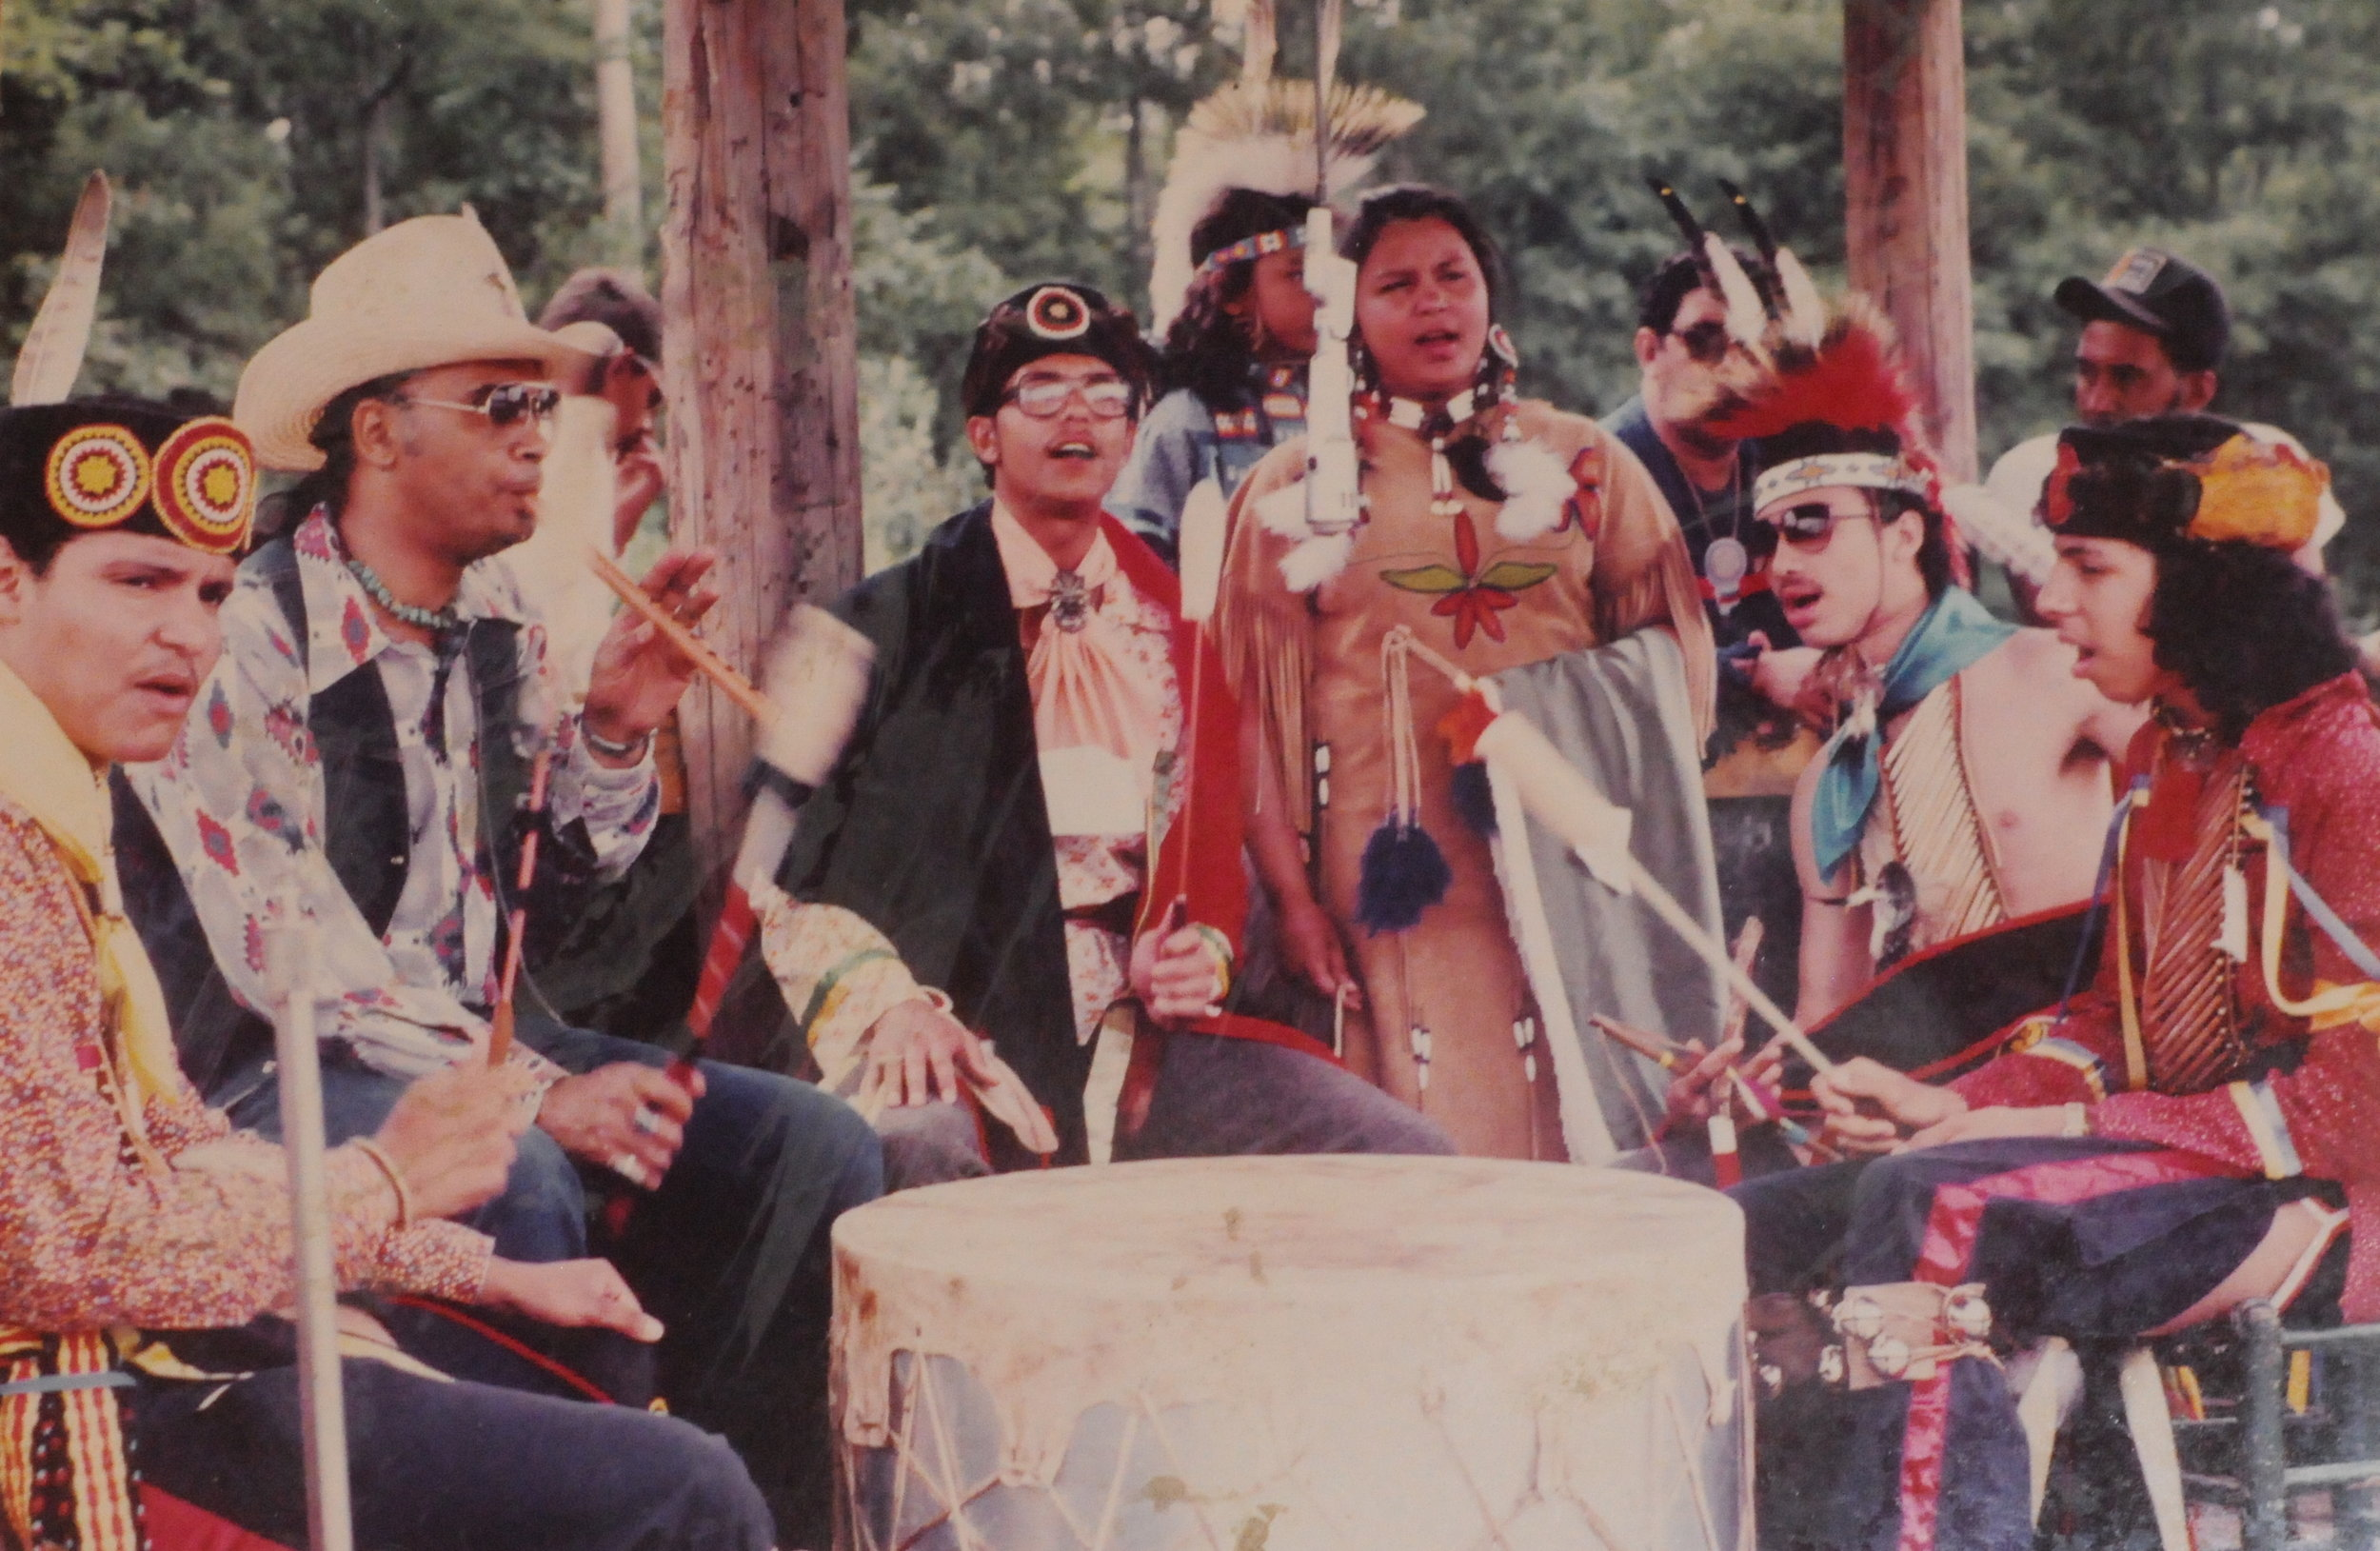 Photo courtesy of the Haliwa-Saponi Indian Tribe. Thumbnail courtesy of Karen Lynch Harvey